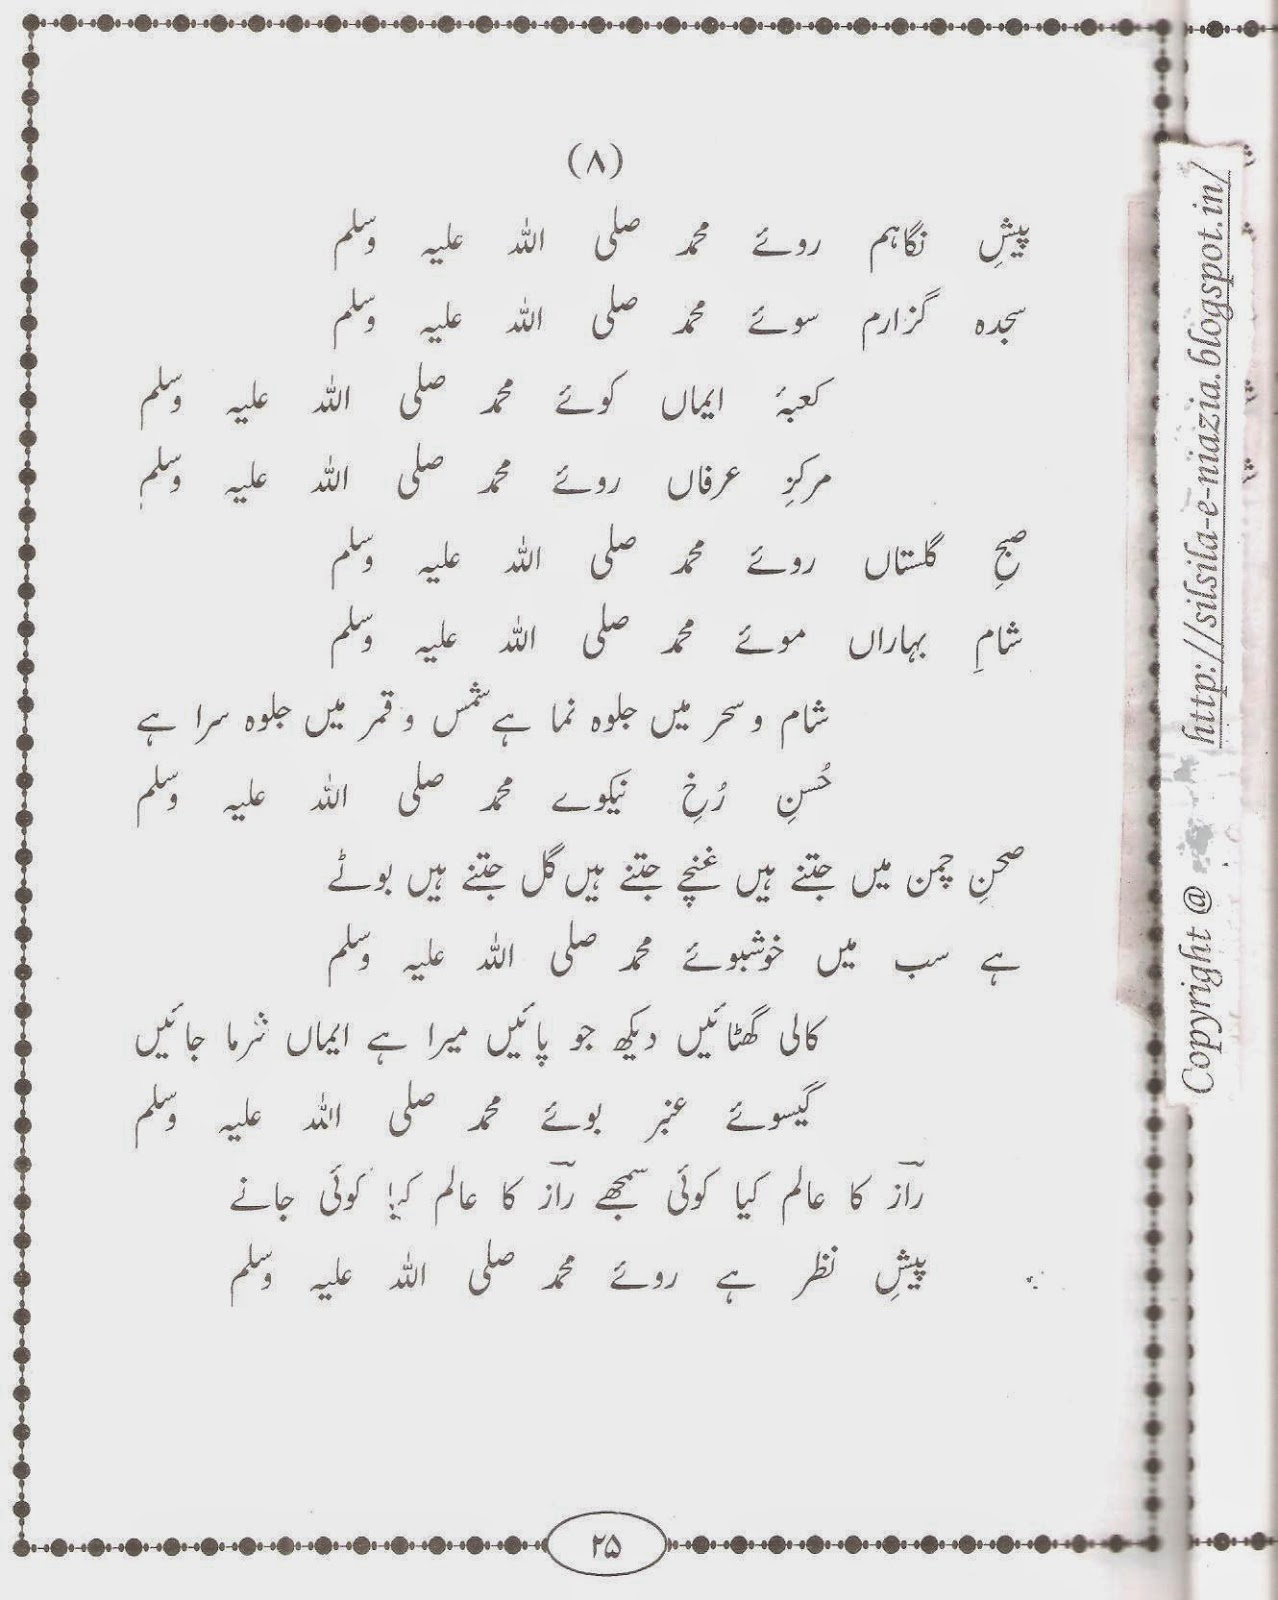 Silsila-e-Niazia: Milade Niazia (Urdu)